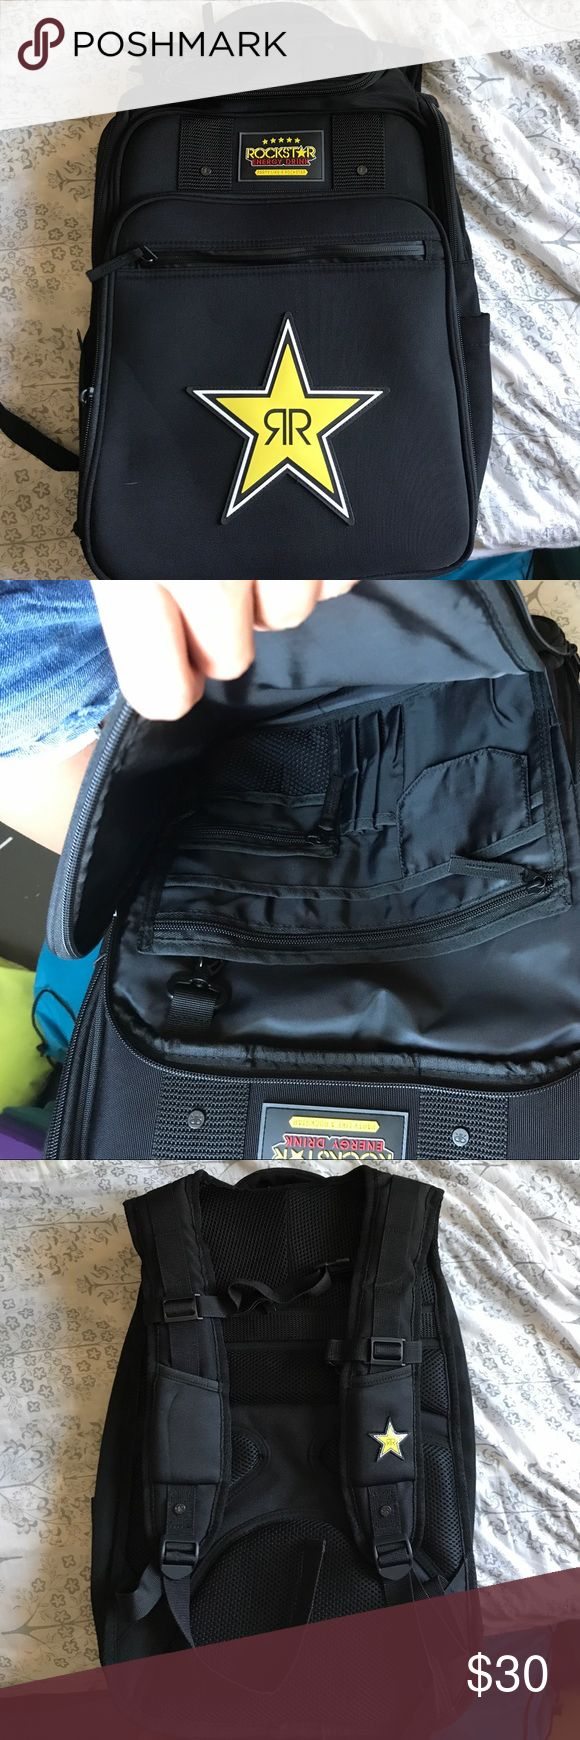 Rockstar backpack Brand new rockstar energy drink back pack! Never used rockstar Bags Backpacks